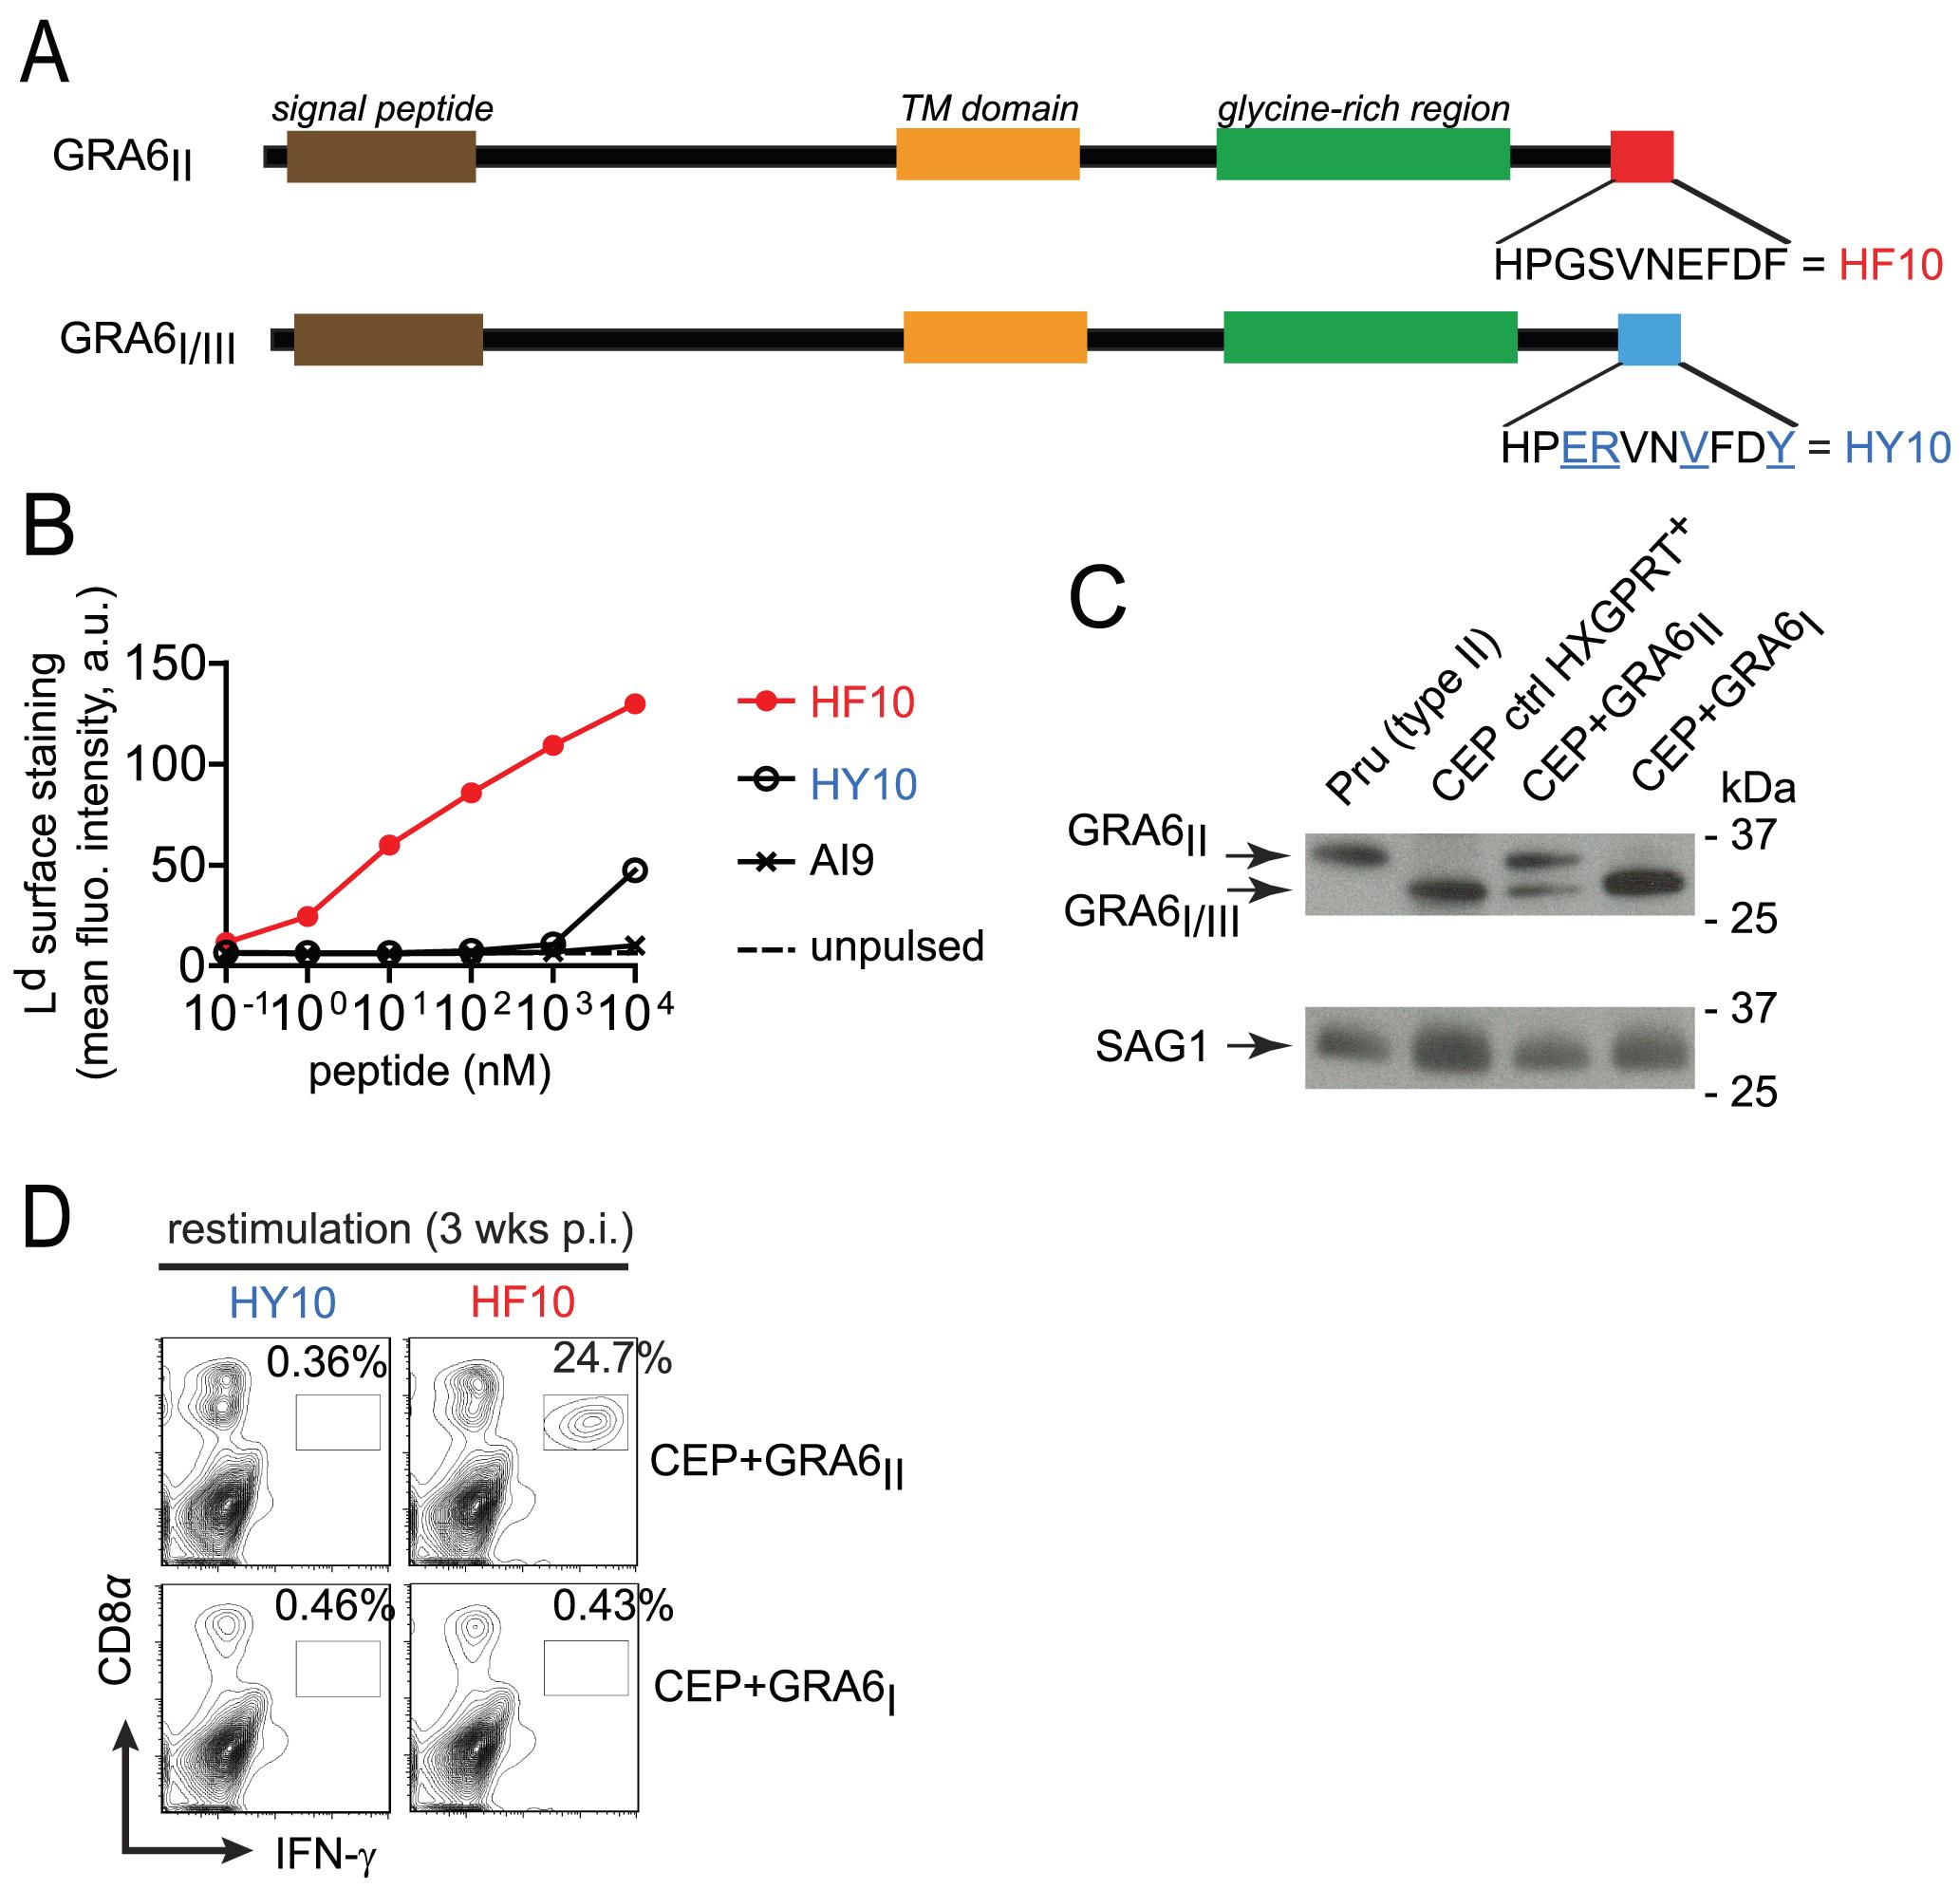 Type III transgenic <i>T. gondii</i> to study parasite immunogenicity.